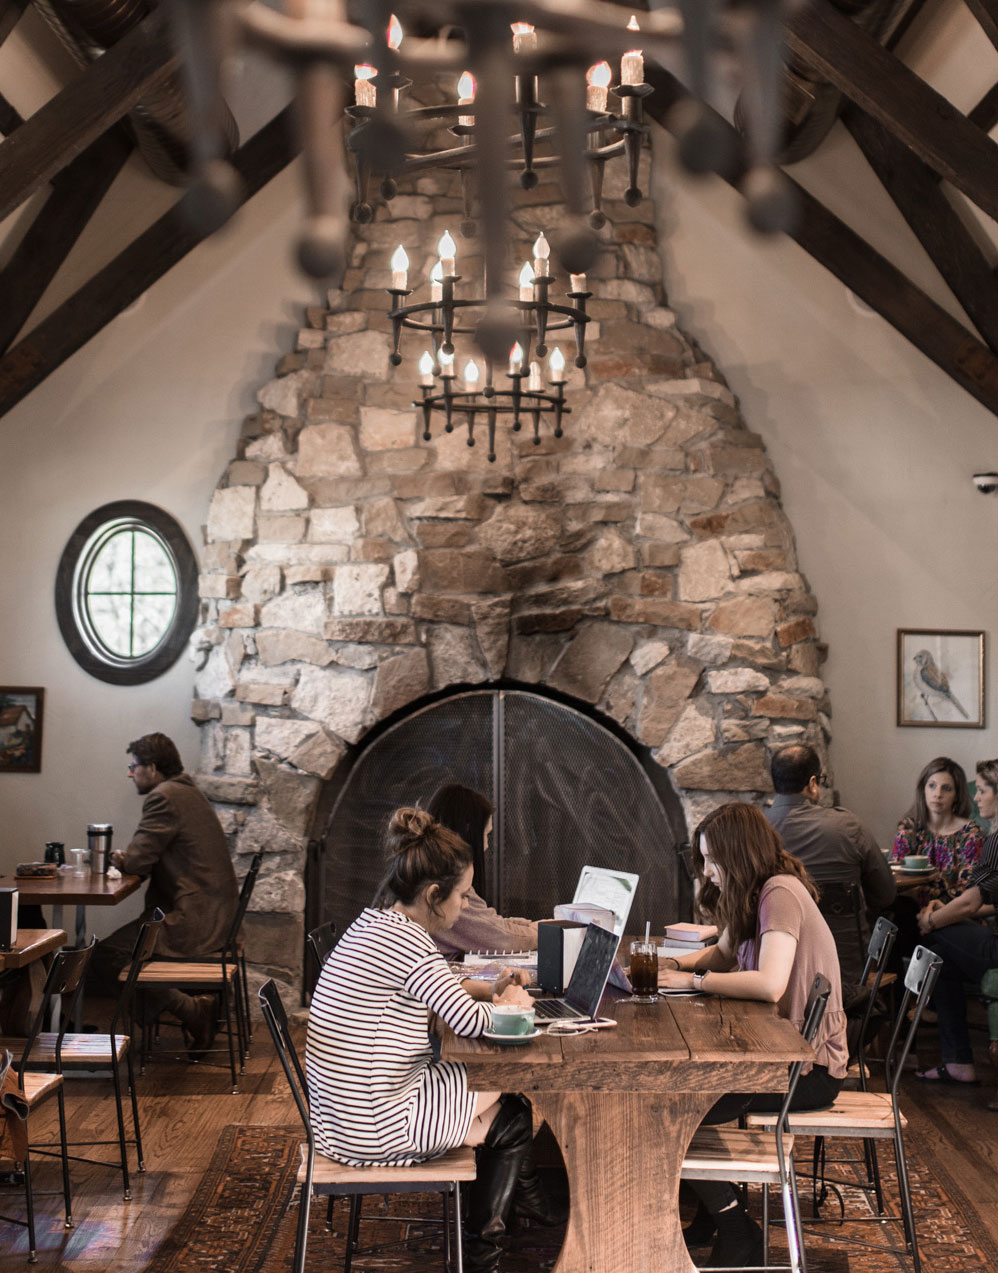 2.jpgKimzey's Coffee Shop Argyle Texas Hayhurst Brothers